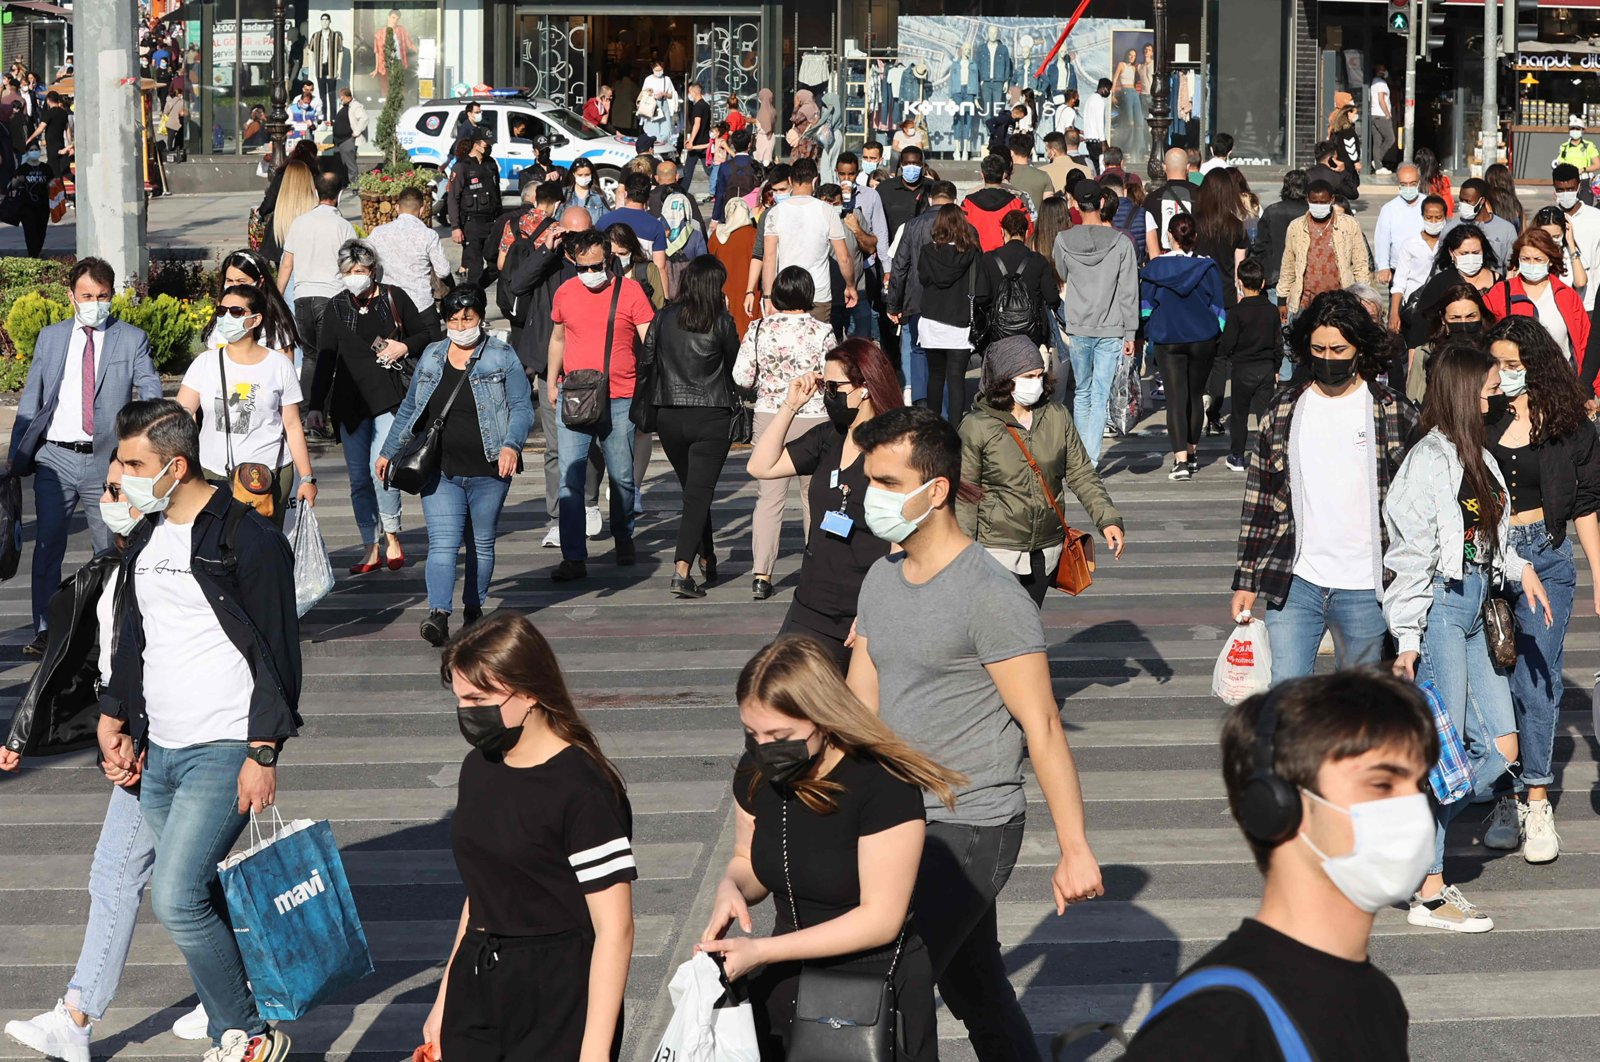 People wearing face masks walk on a street in the capital Ankara, Turkey, May 17, 2021. (AFP Photo)